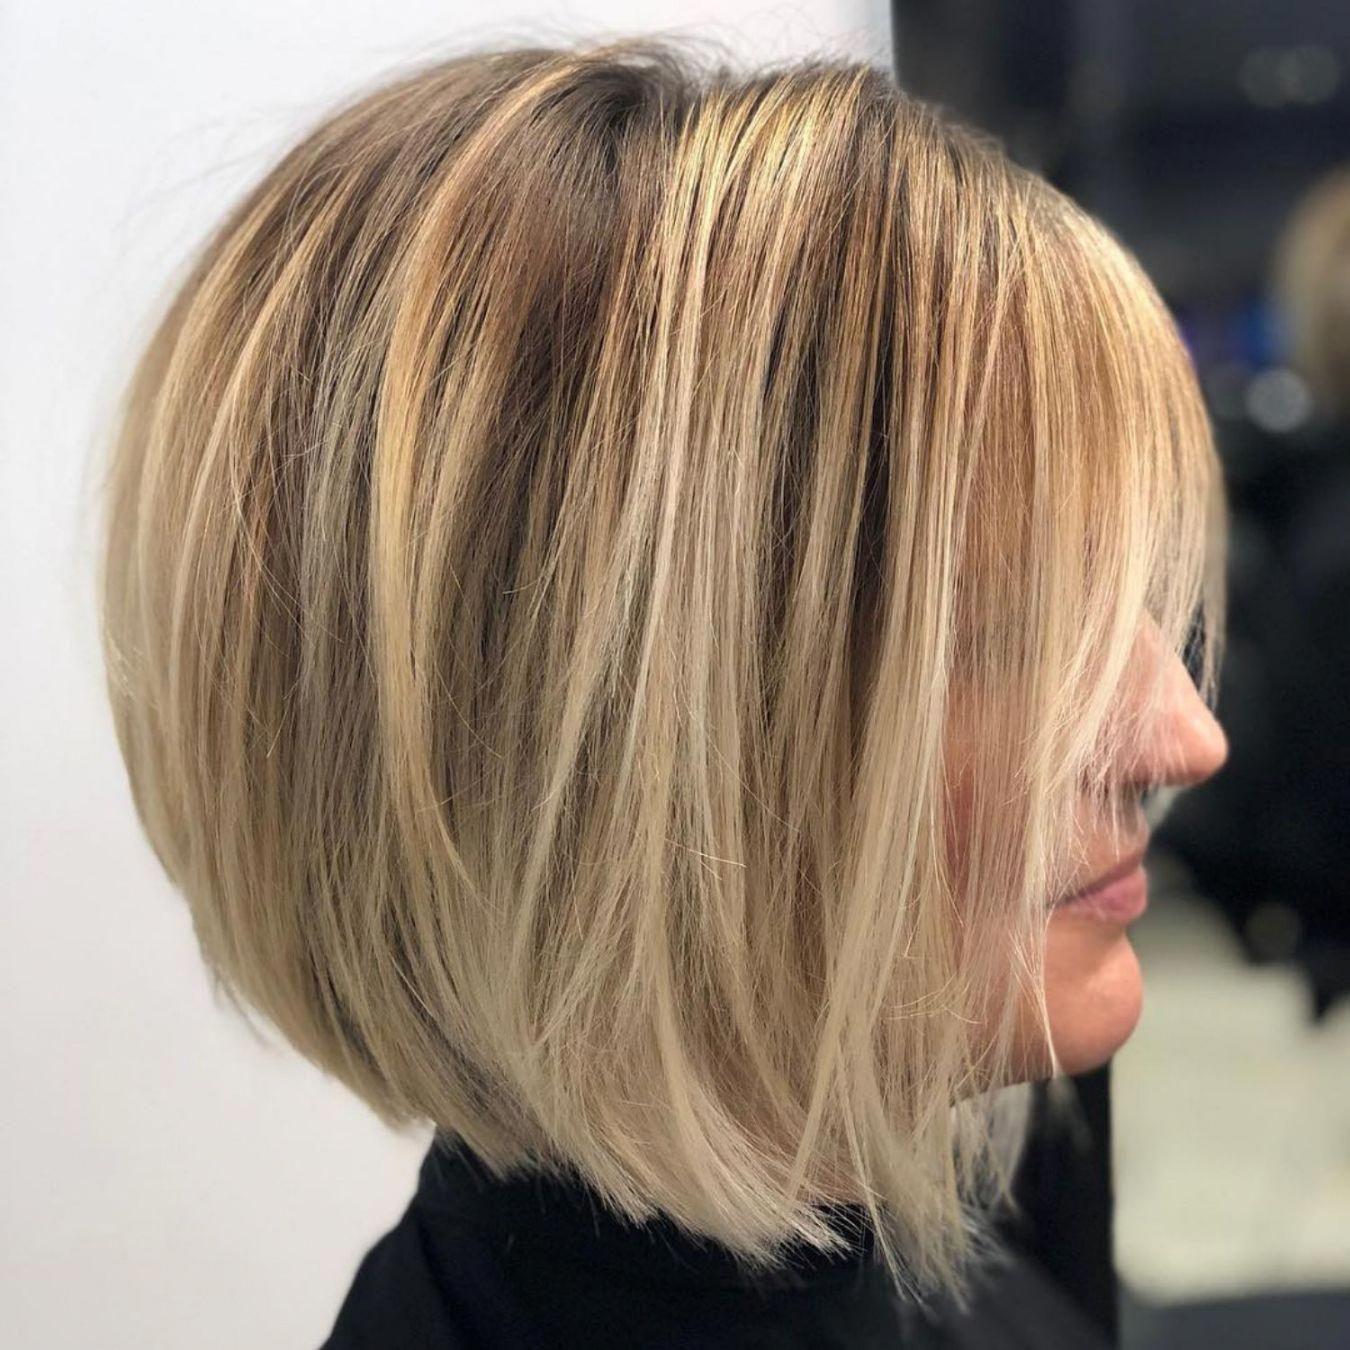 2019 S Best Bob Hairstyles Haircuts For Women In 2020 Frisuren Haarschnitt Bob Frisur